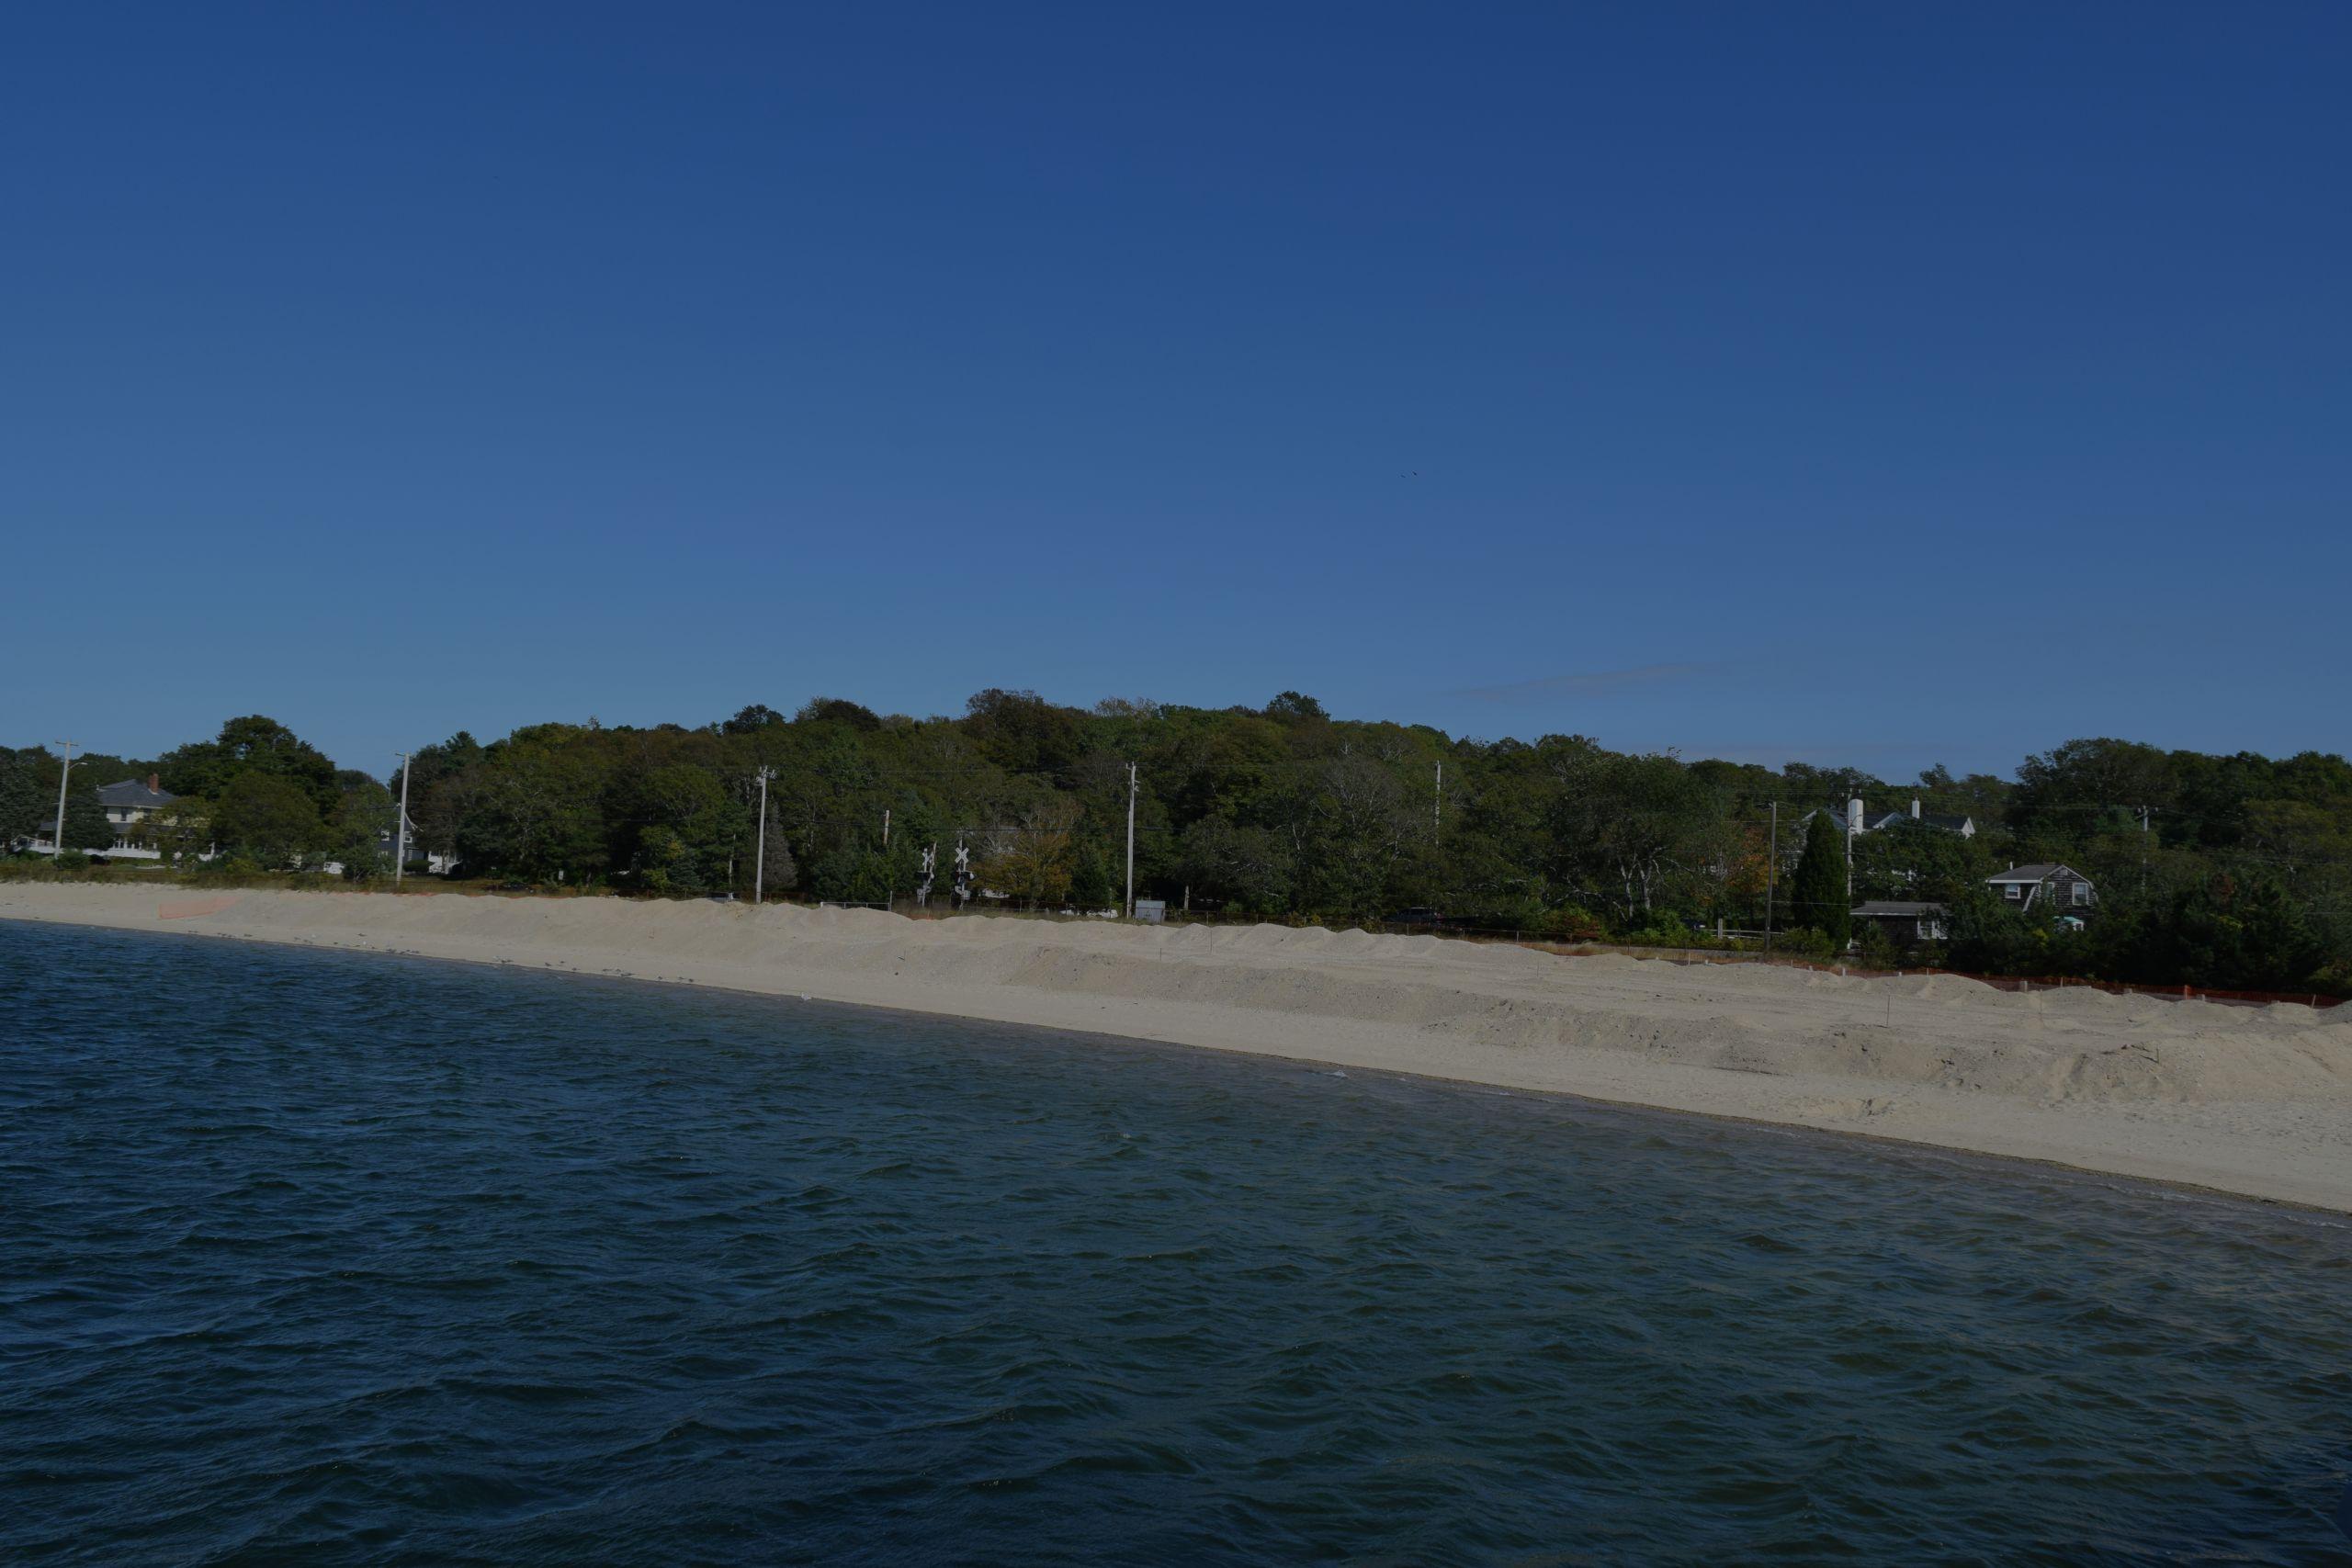 dredging cape cod monument beach and barlows landing beach